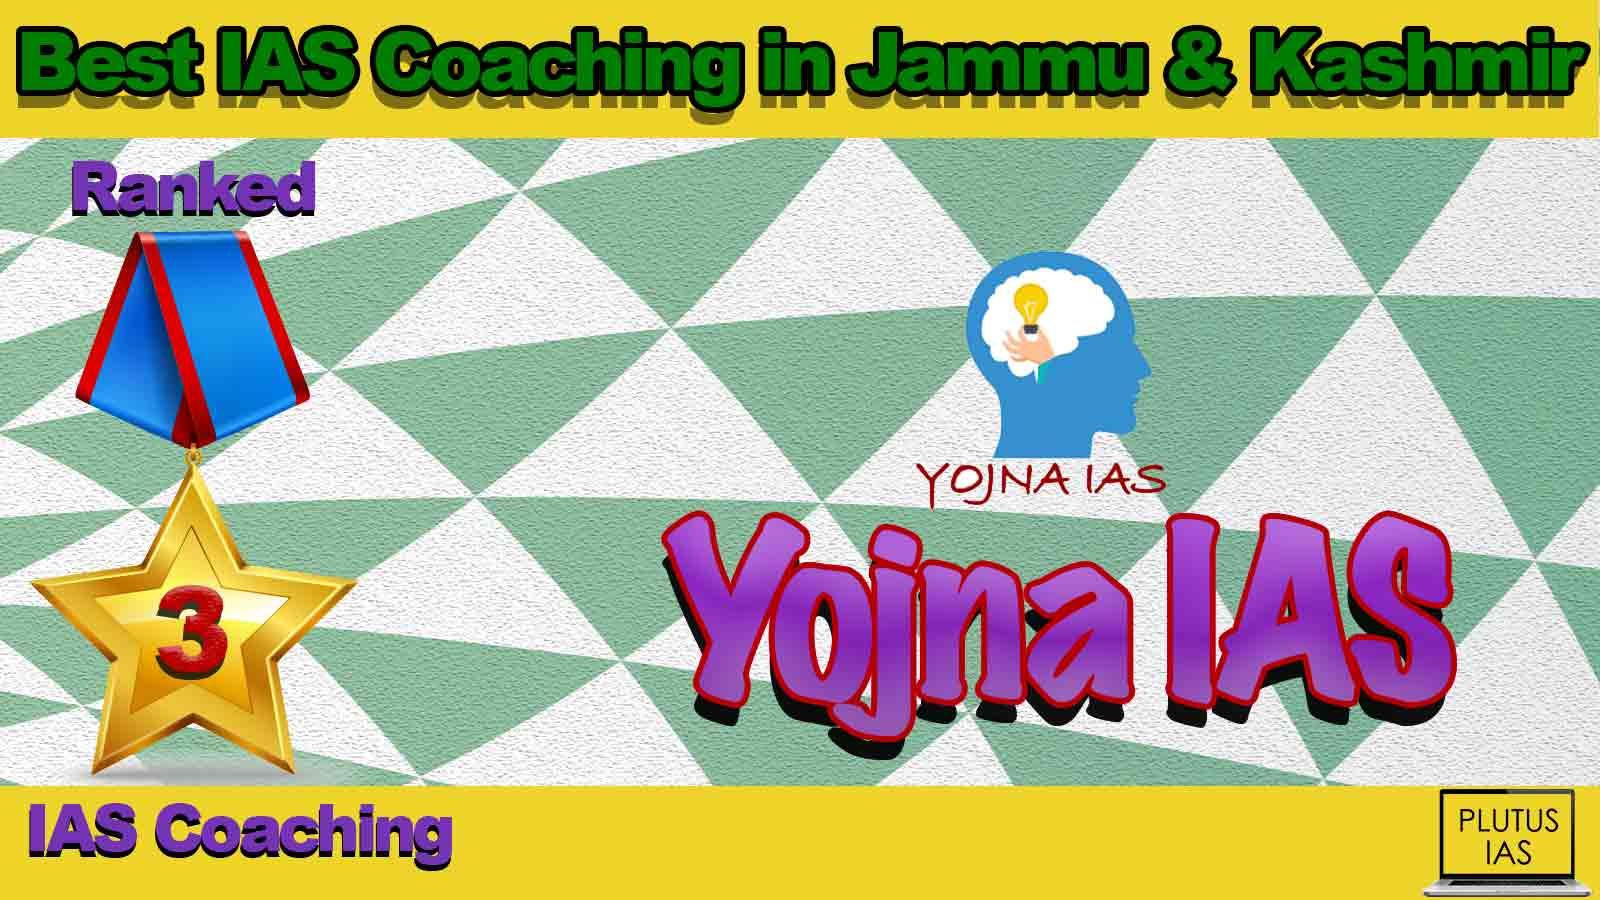 Best IAS Coaching in Jammu & Kashmir